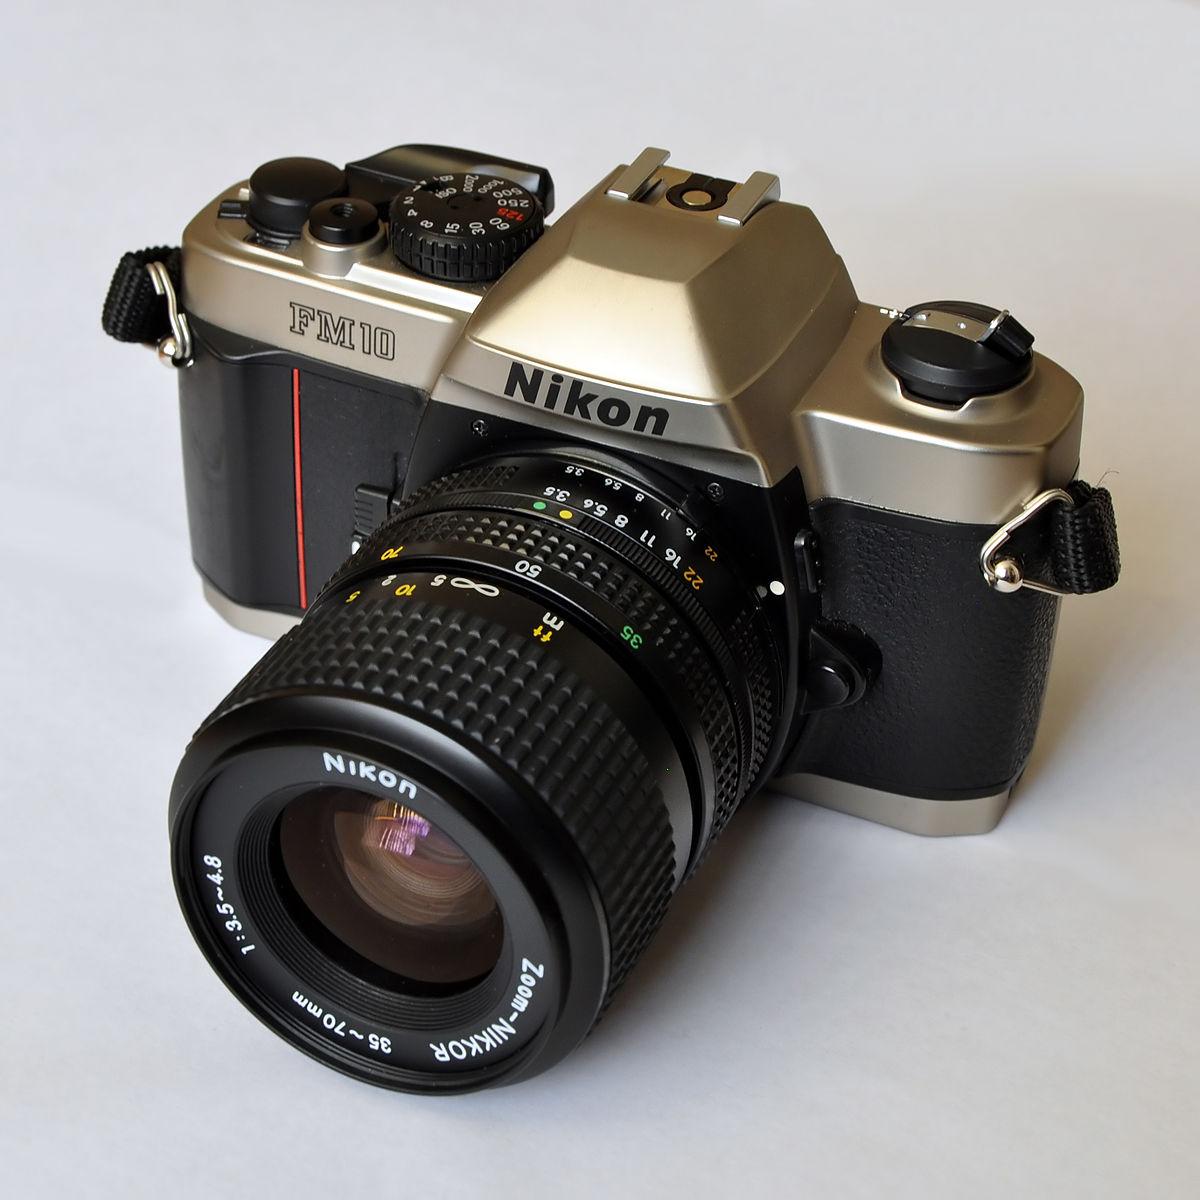 nikon fm10 wikipedia rh en wikipedia org Nikon FG Instruction Manual Nikon Film Cameras